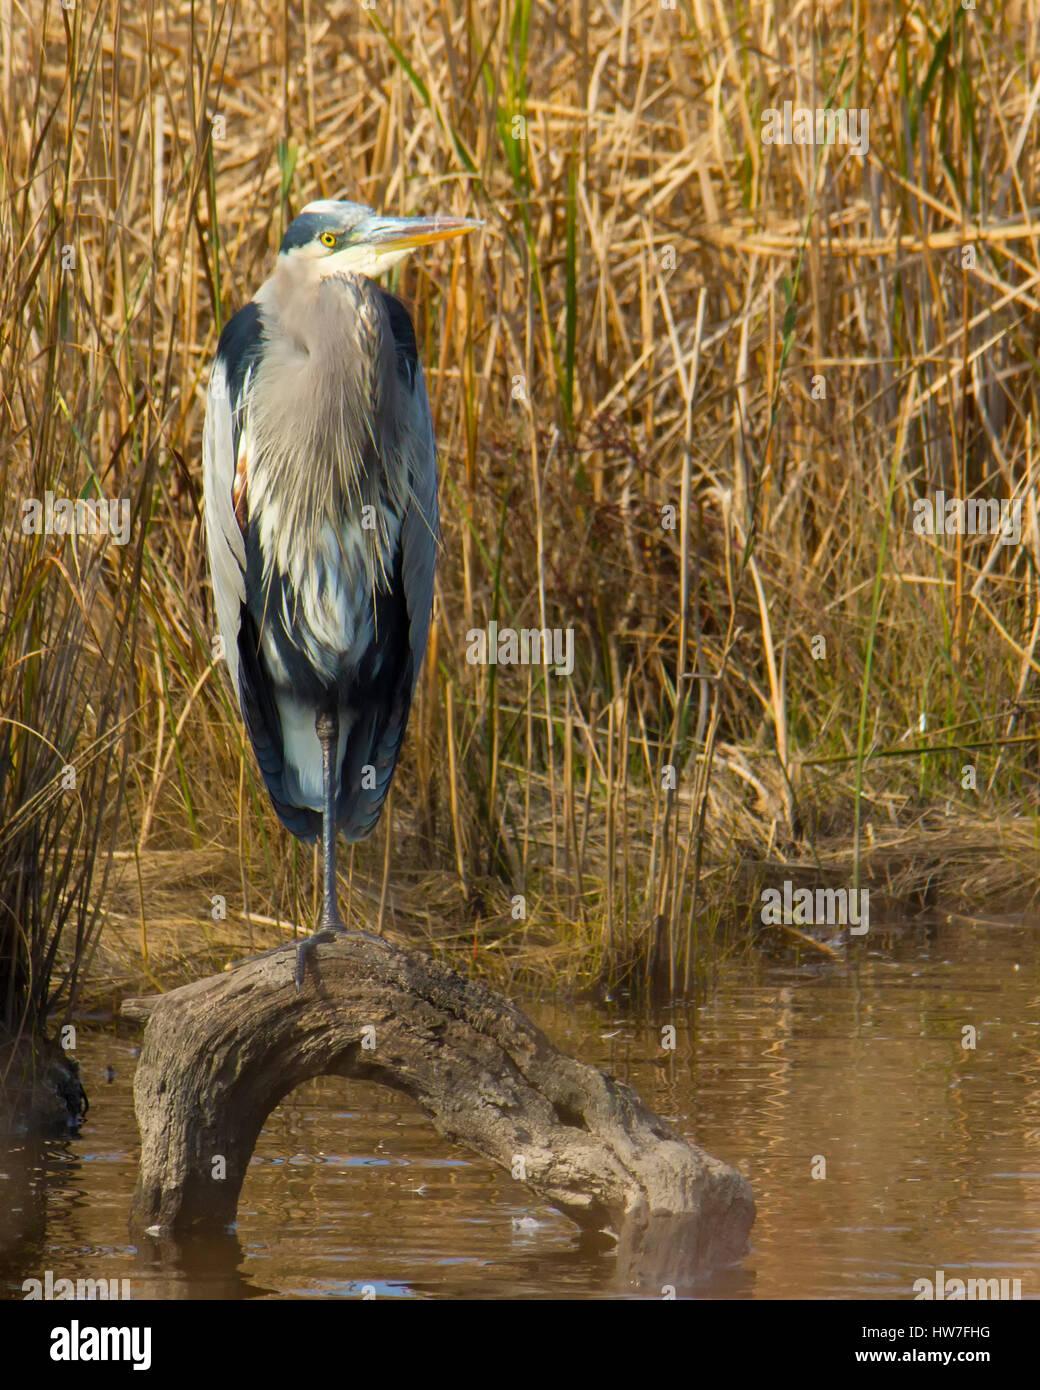 Great blue heron standing on log in water - Stock Image